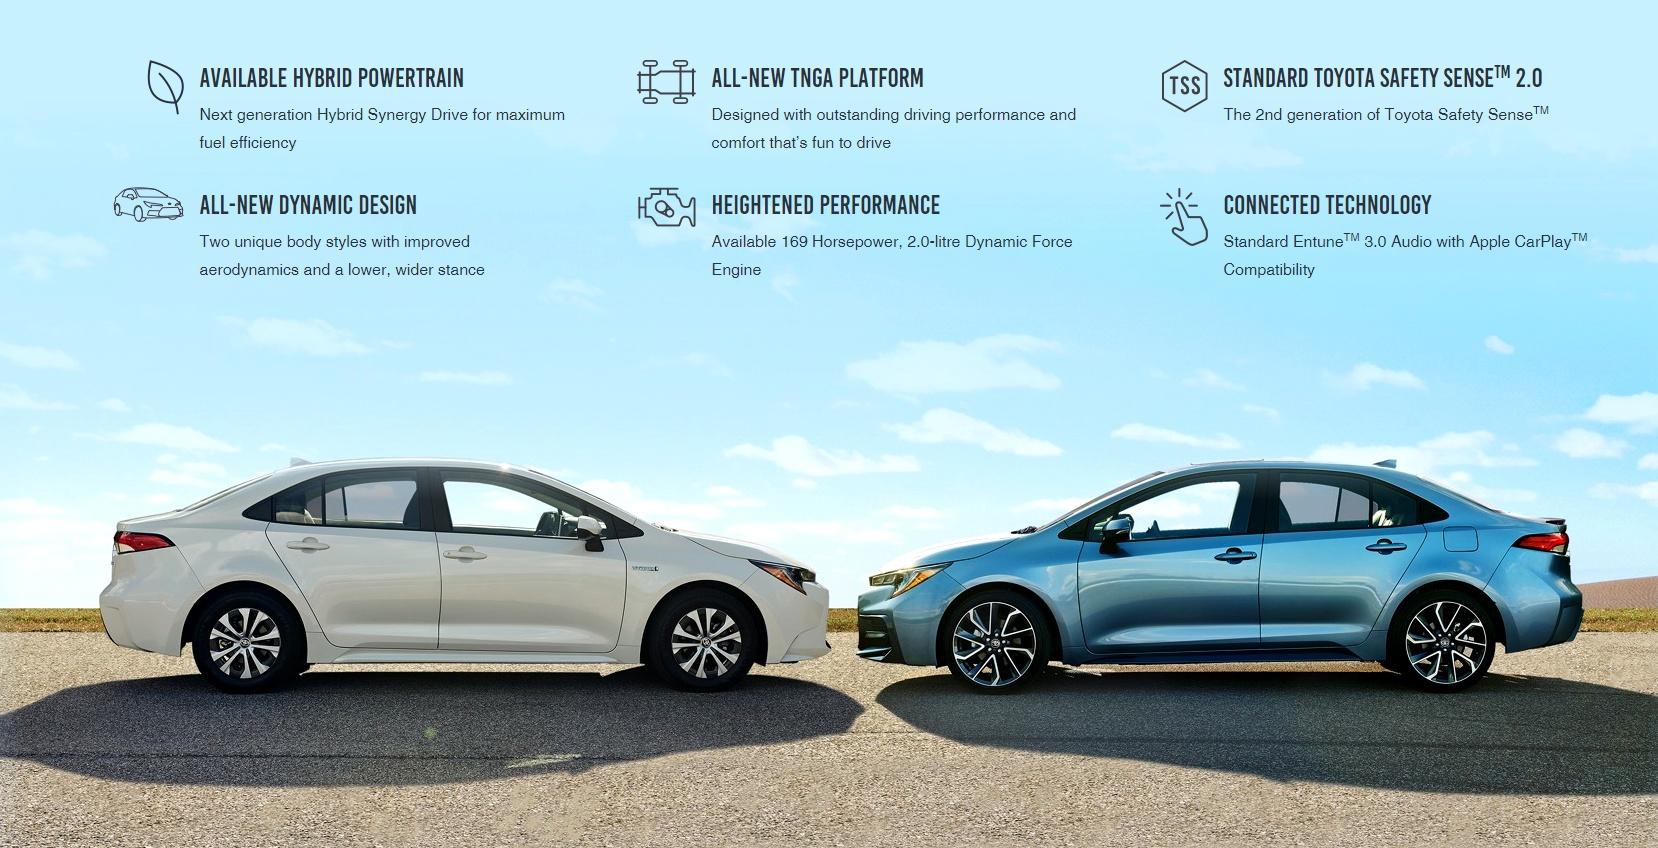 2020 Toyota Corolla & Toyota Corolla Hybrid Features